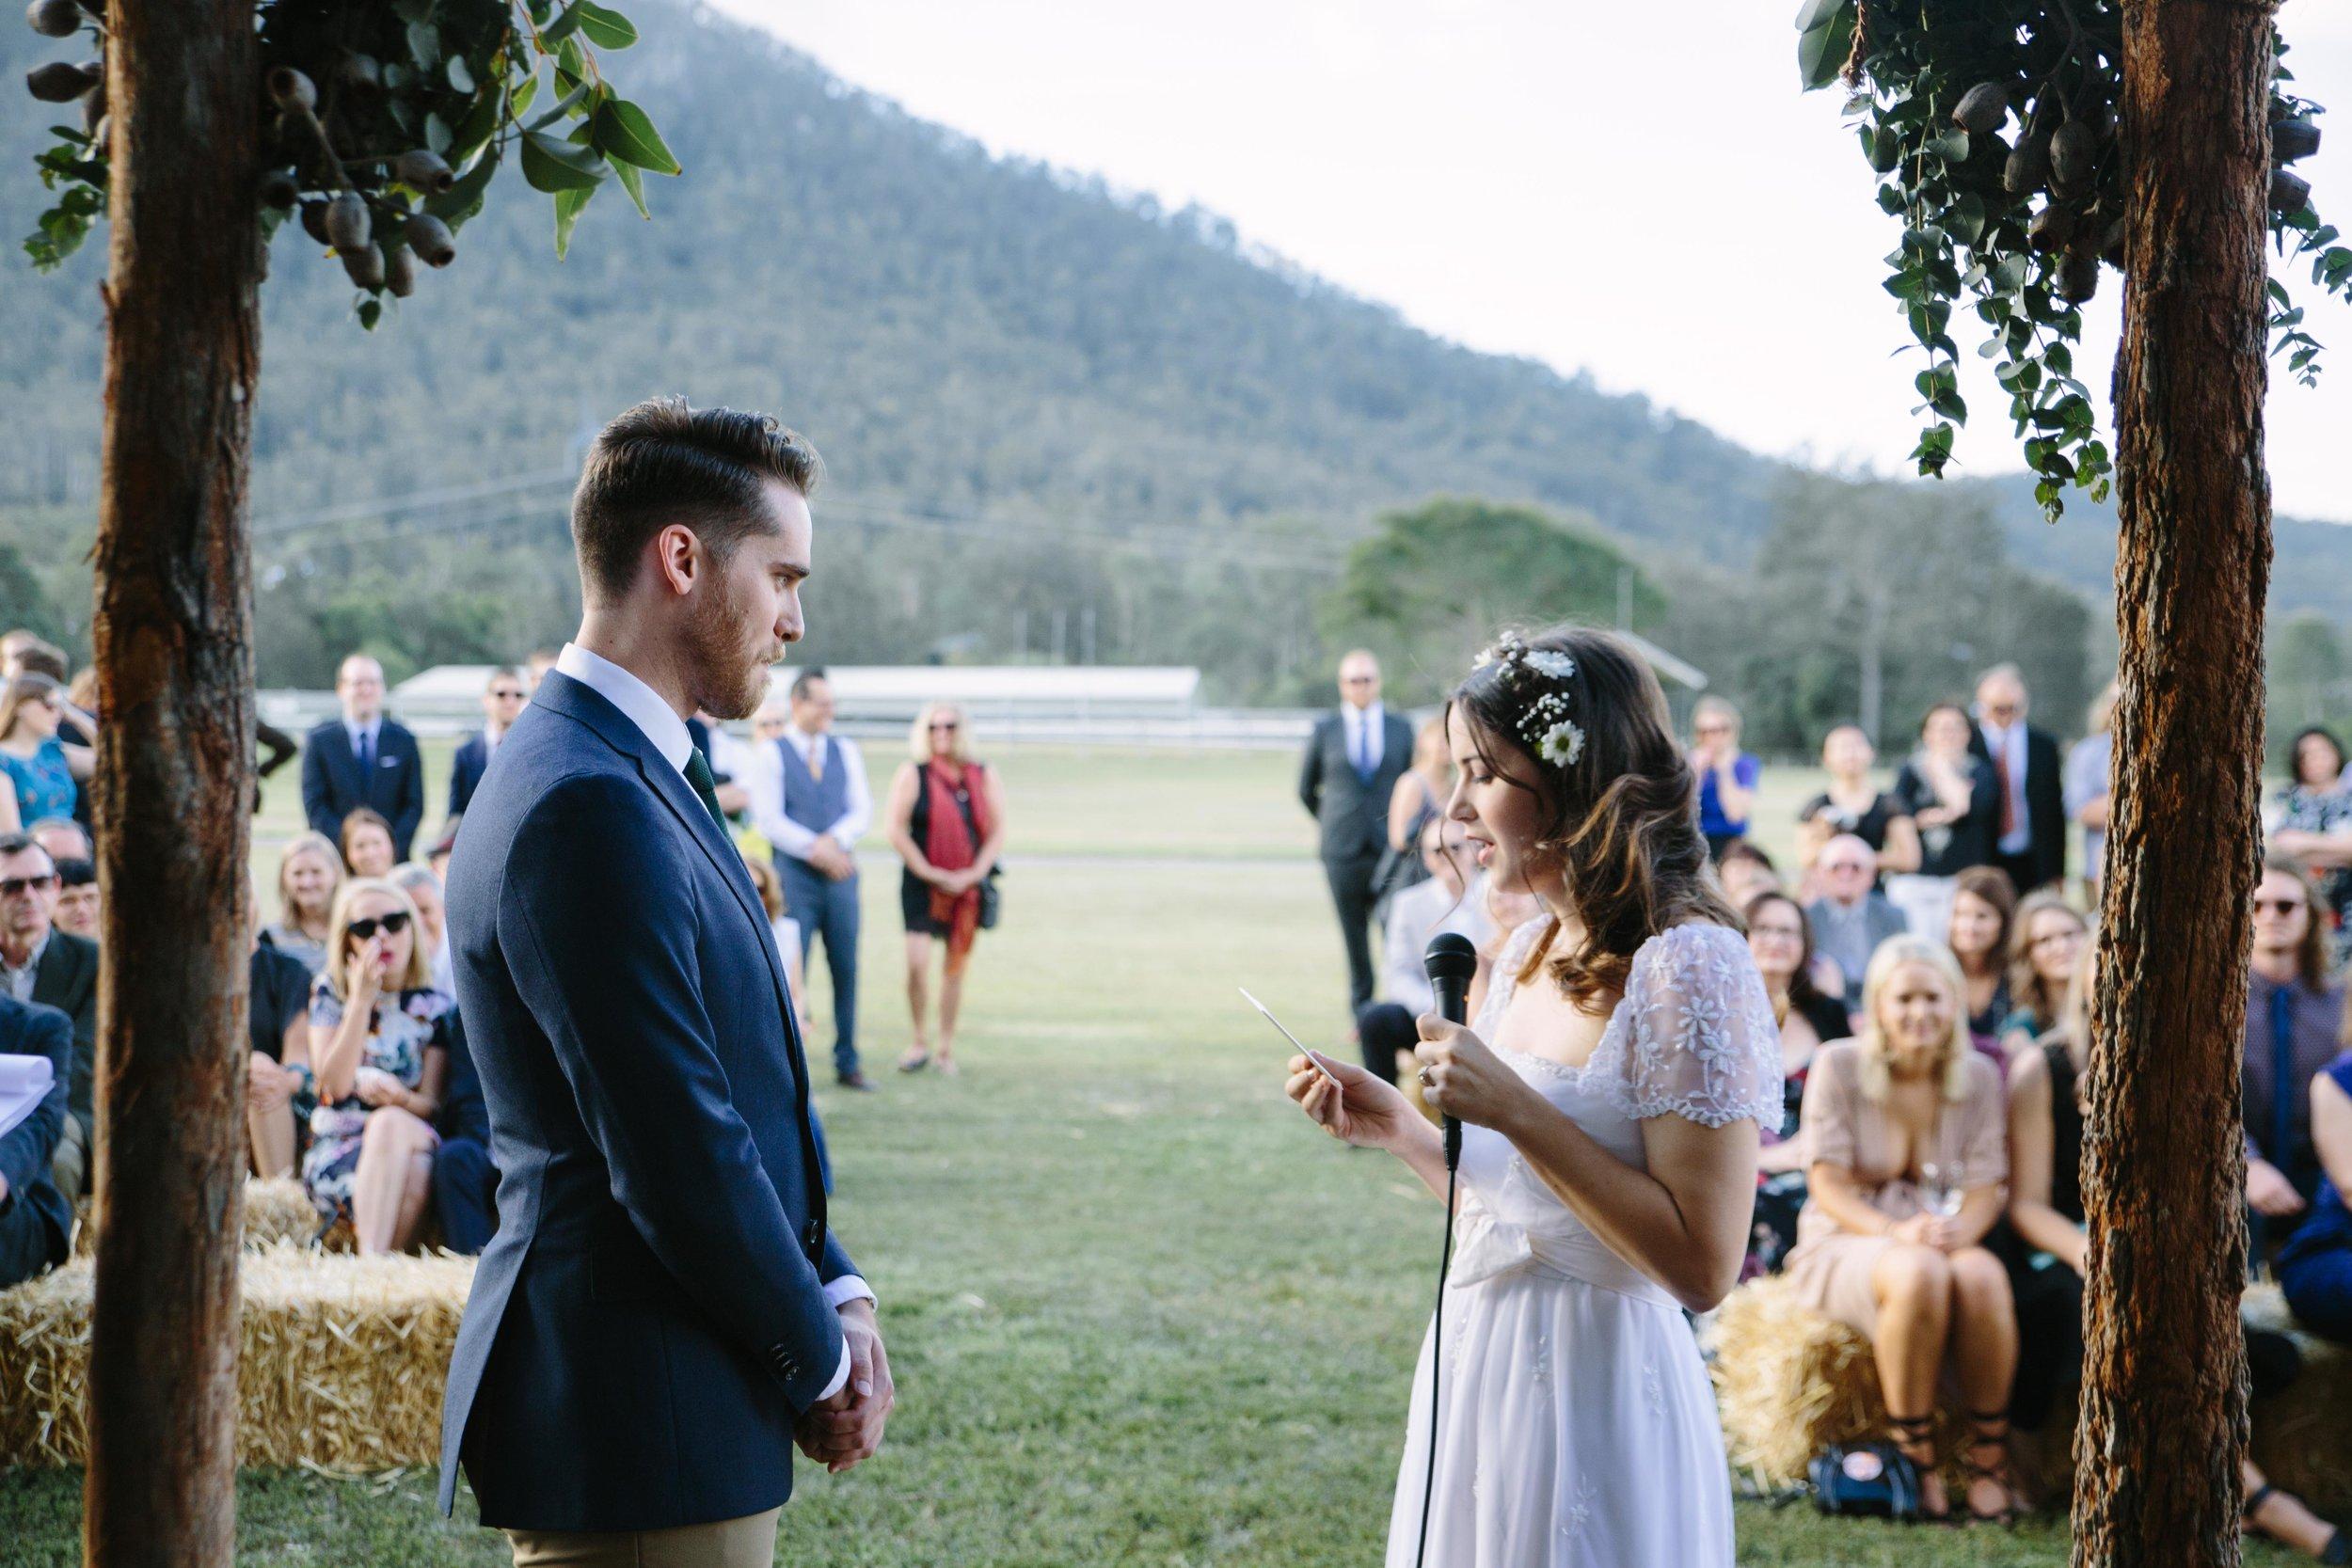 Ceremony_Camera 2_low res-5860.jpg